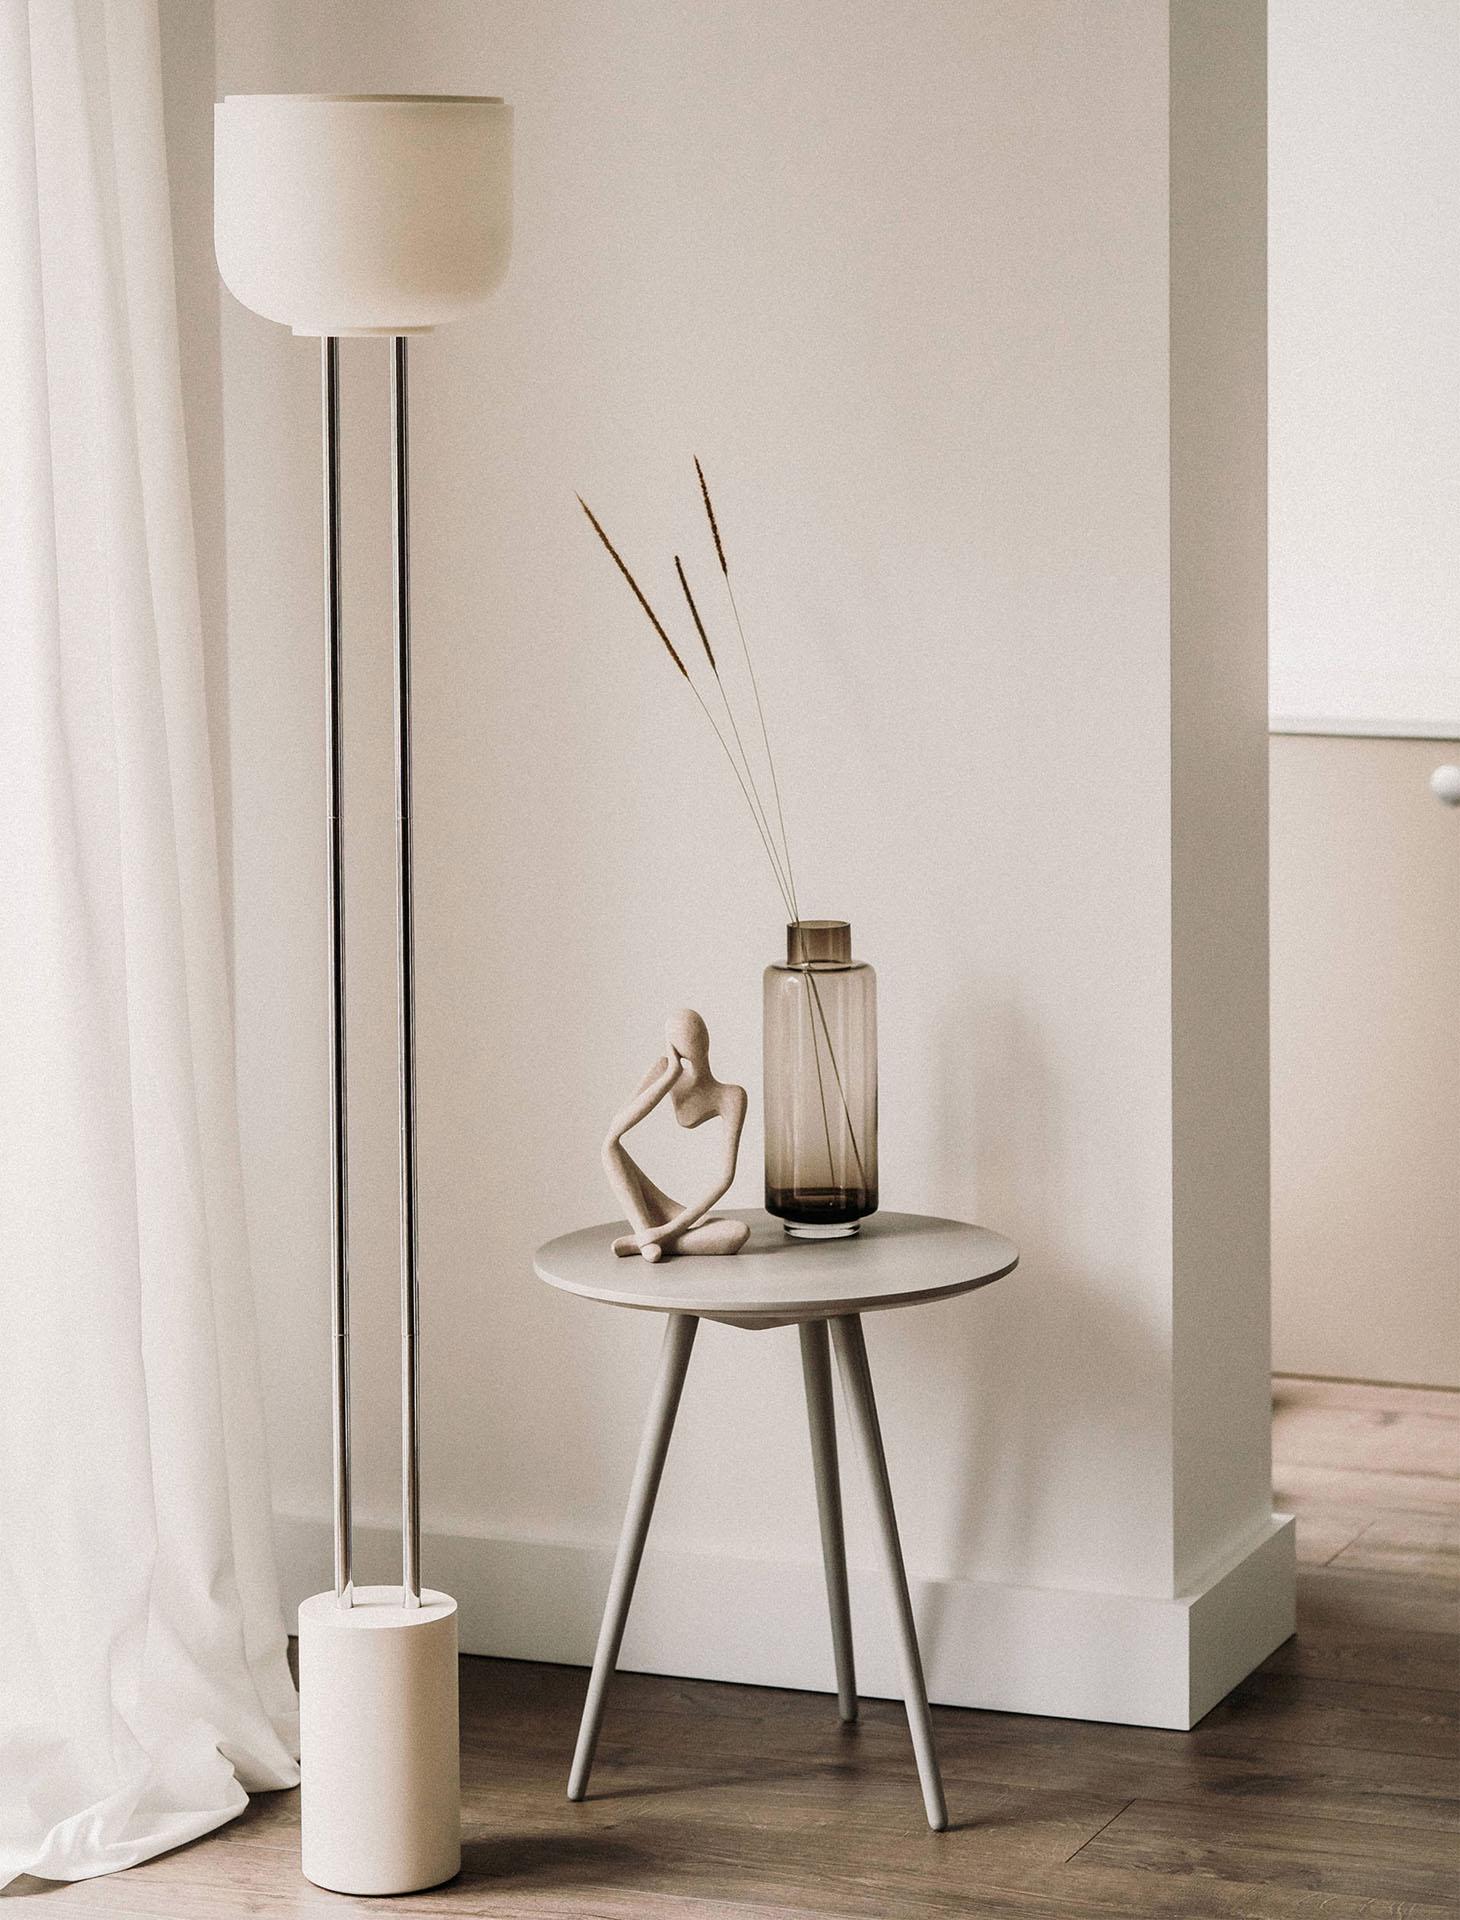 Arpeggio Floor Light for Gantri, in a minimal living room setting